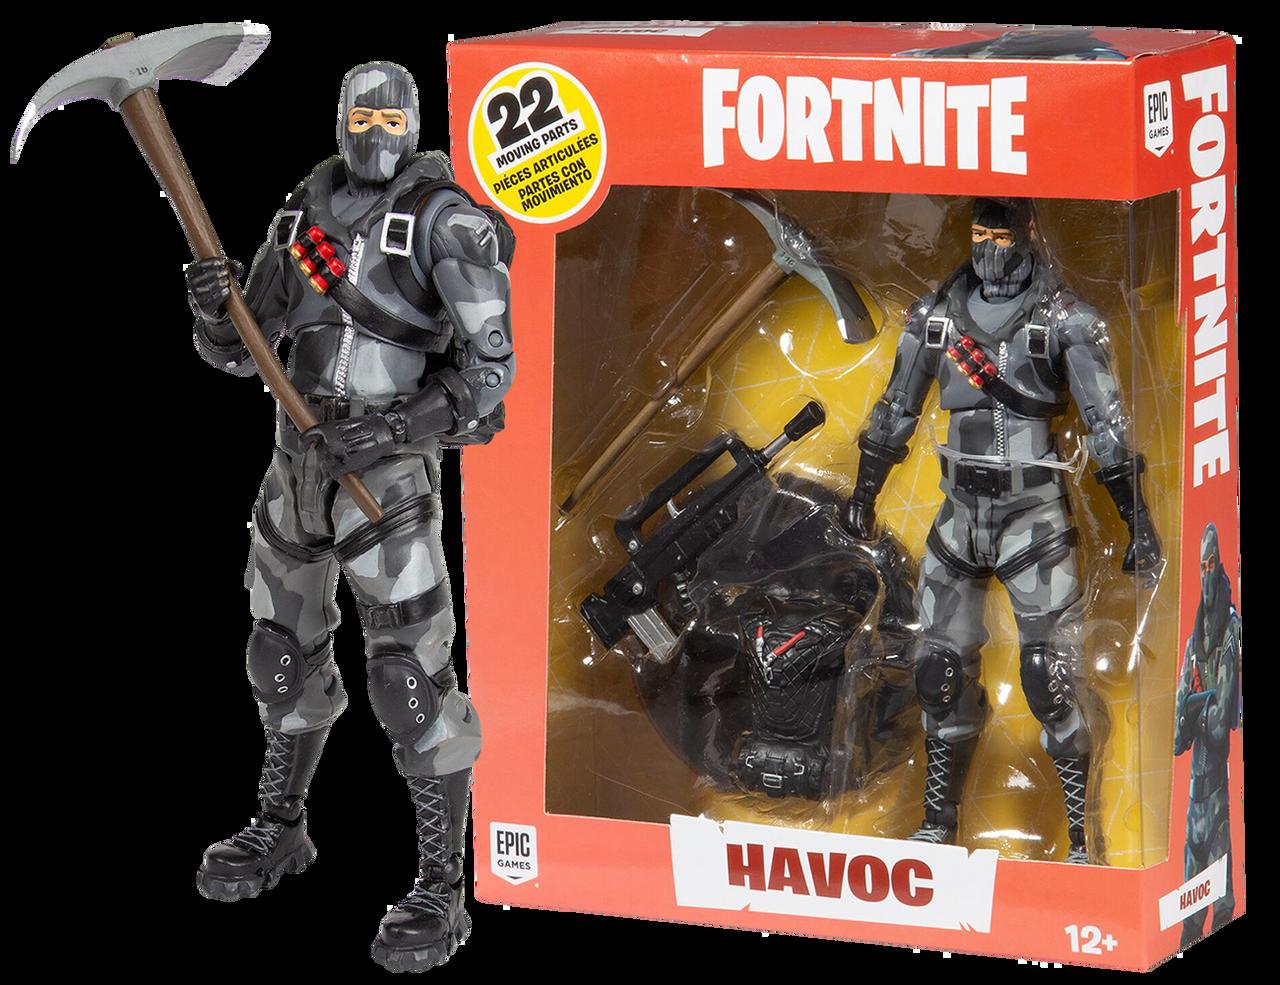 Fortnite Havoc Figure